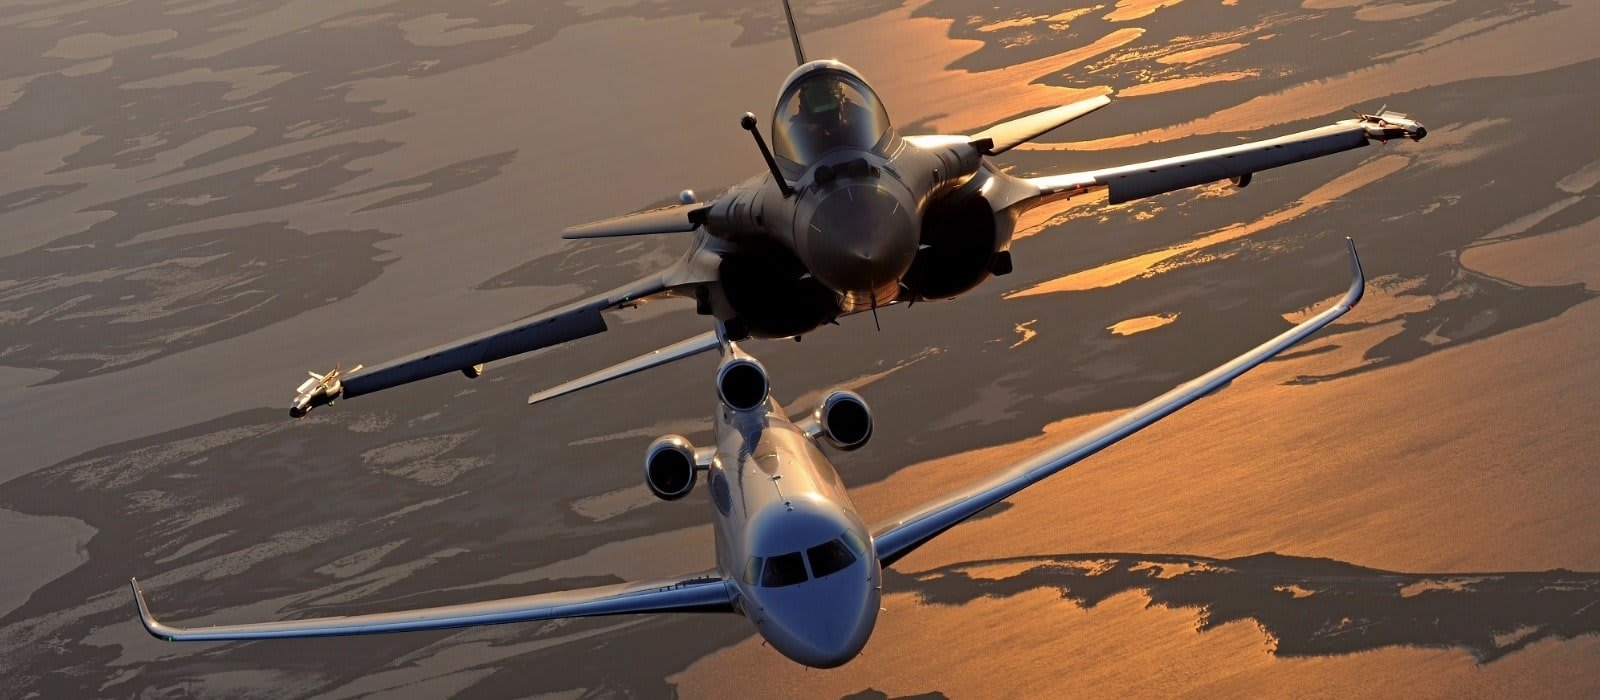 About Dassault Aviation Group